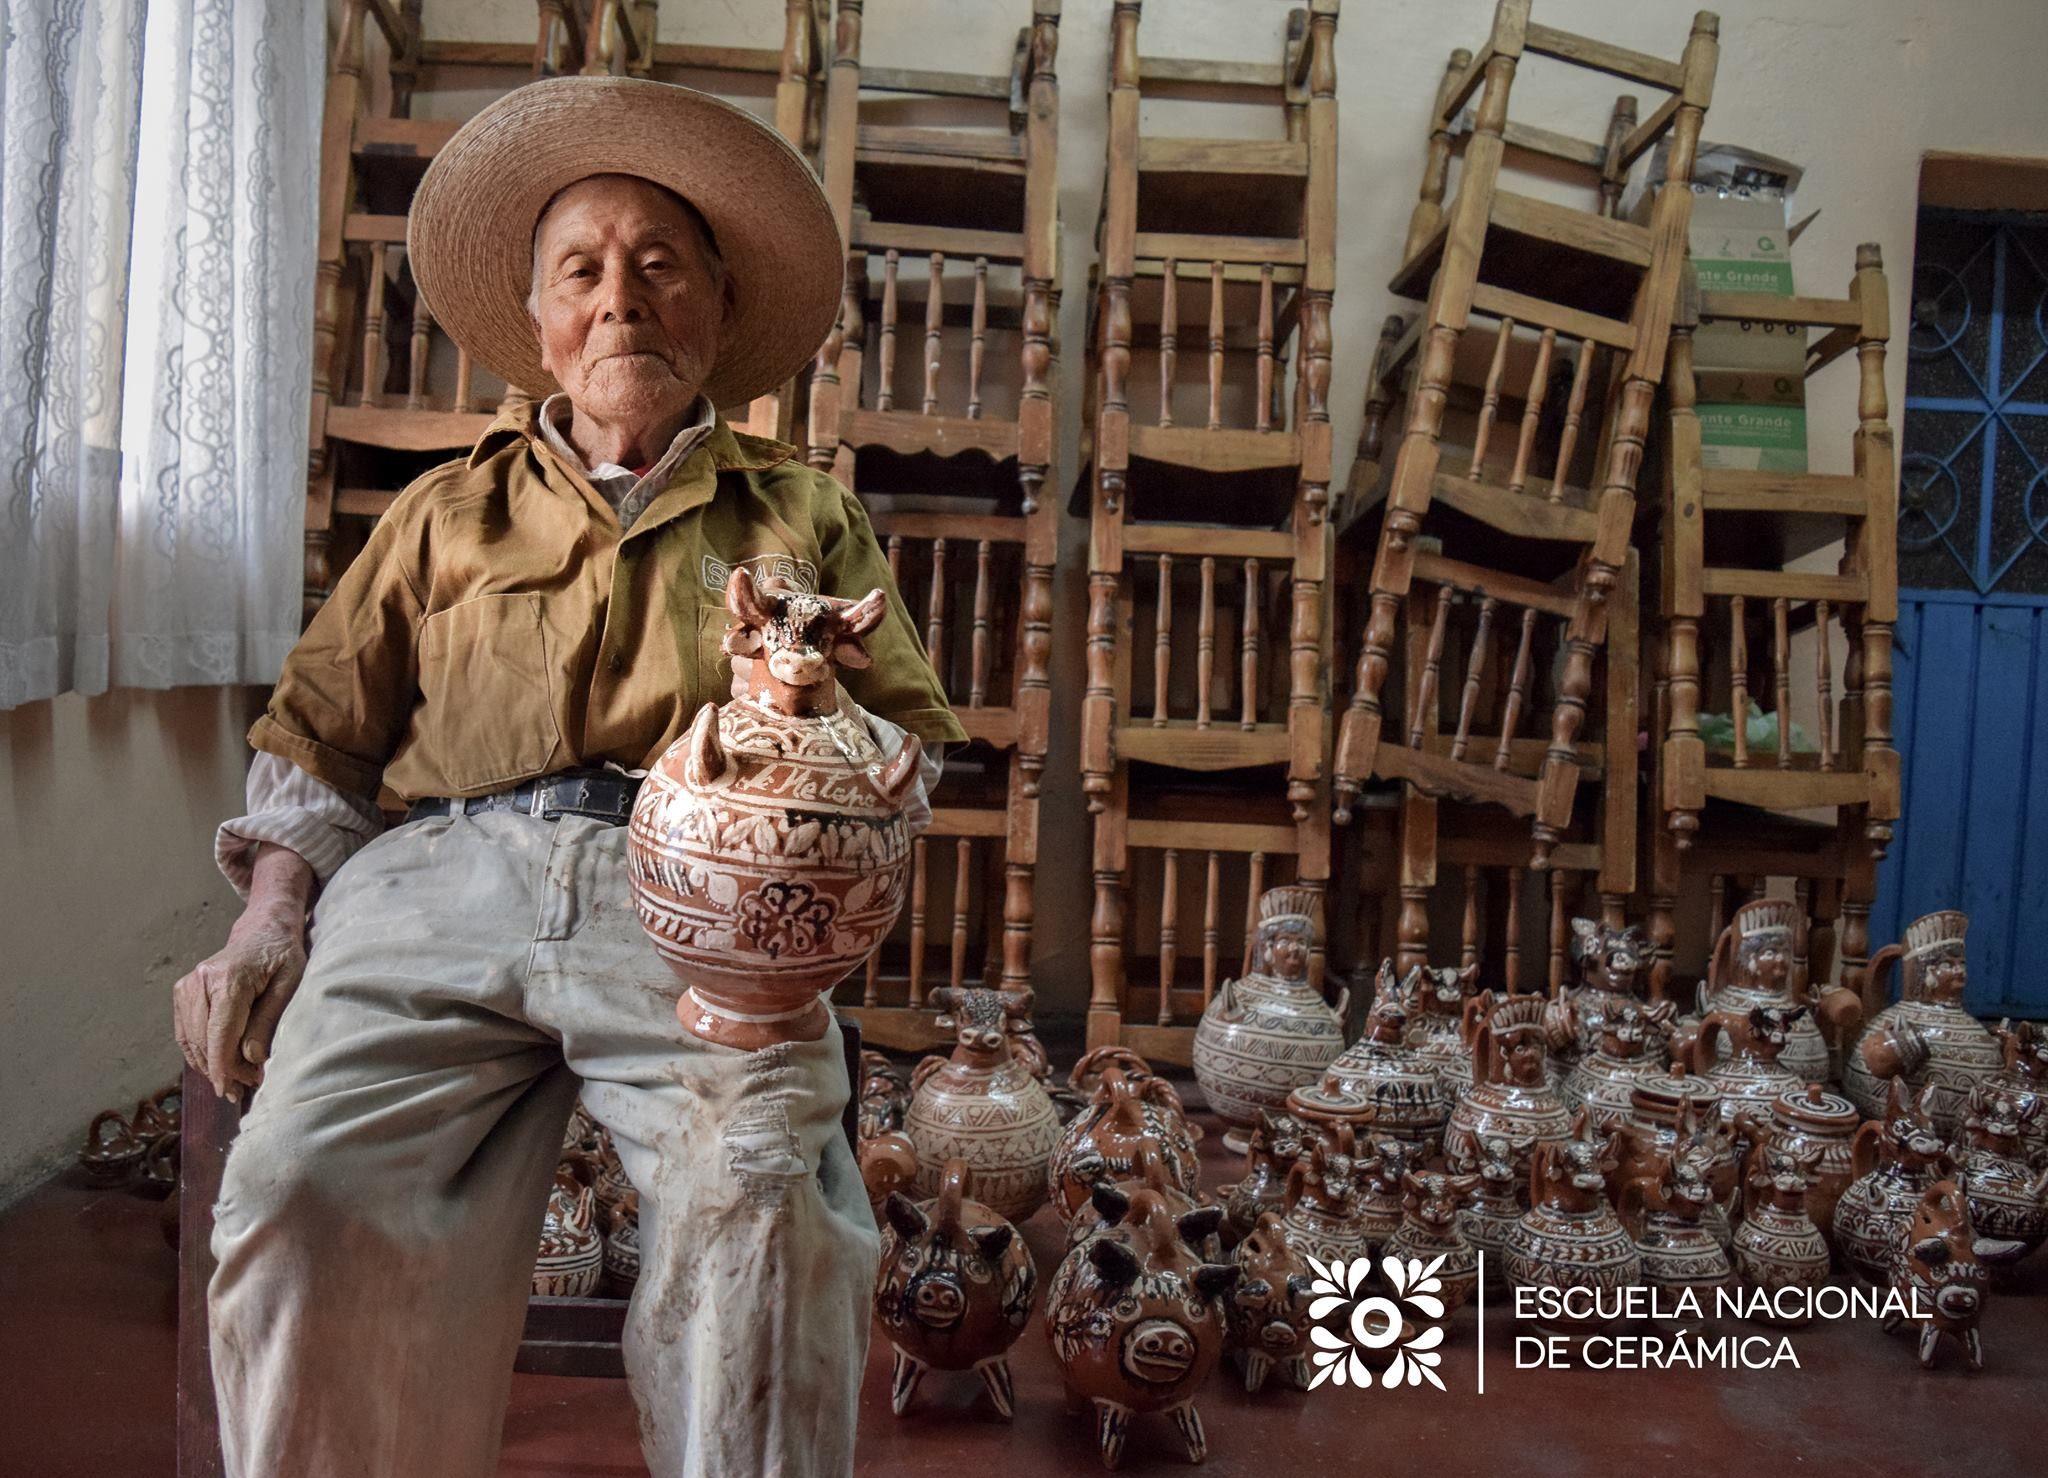 Master ceramic artist Irma Garcia Blanco stands between